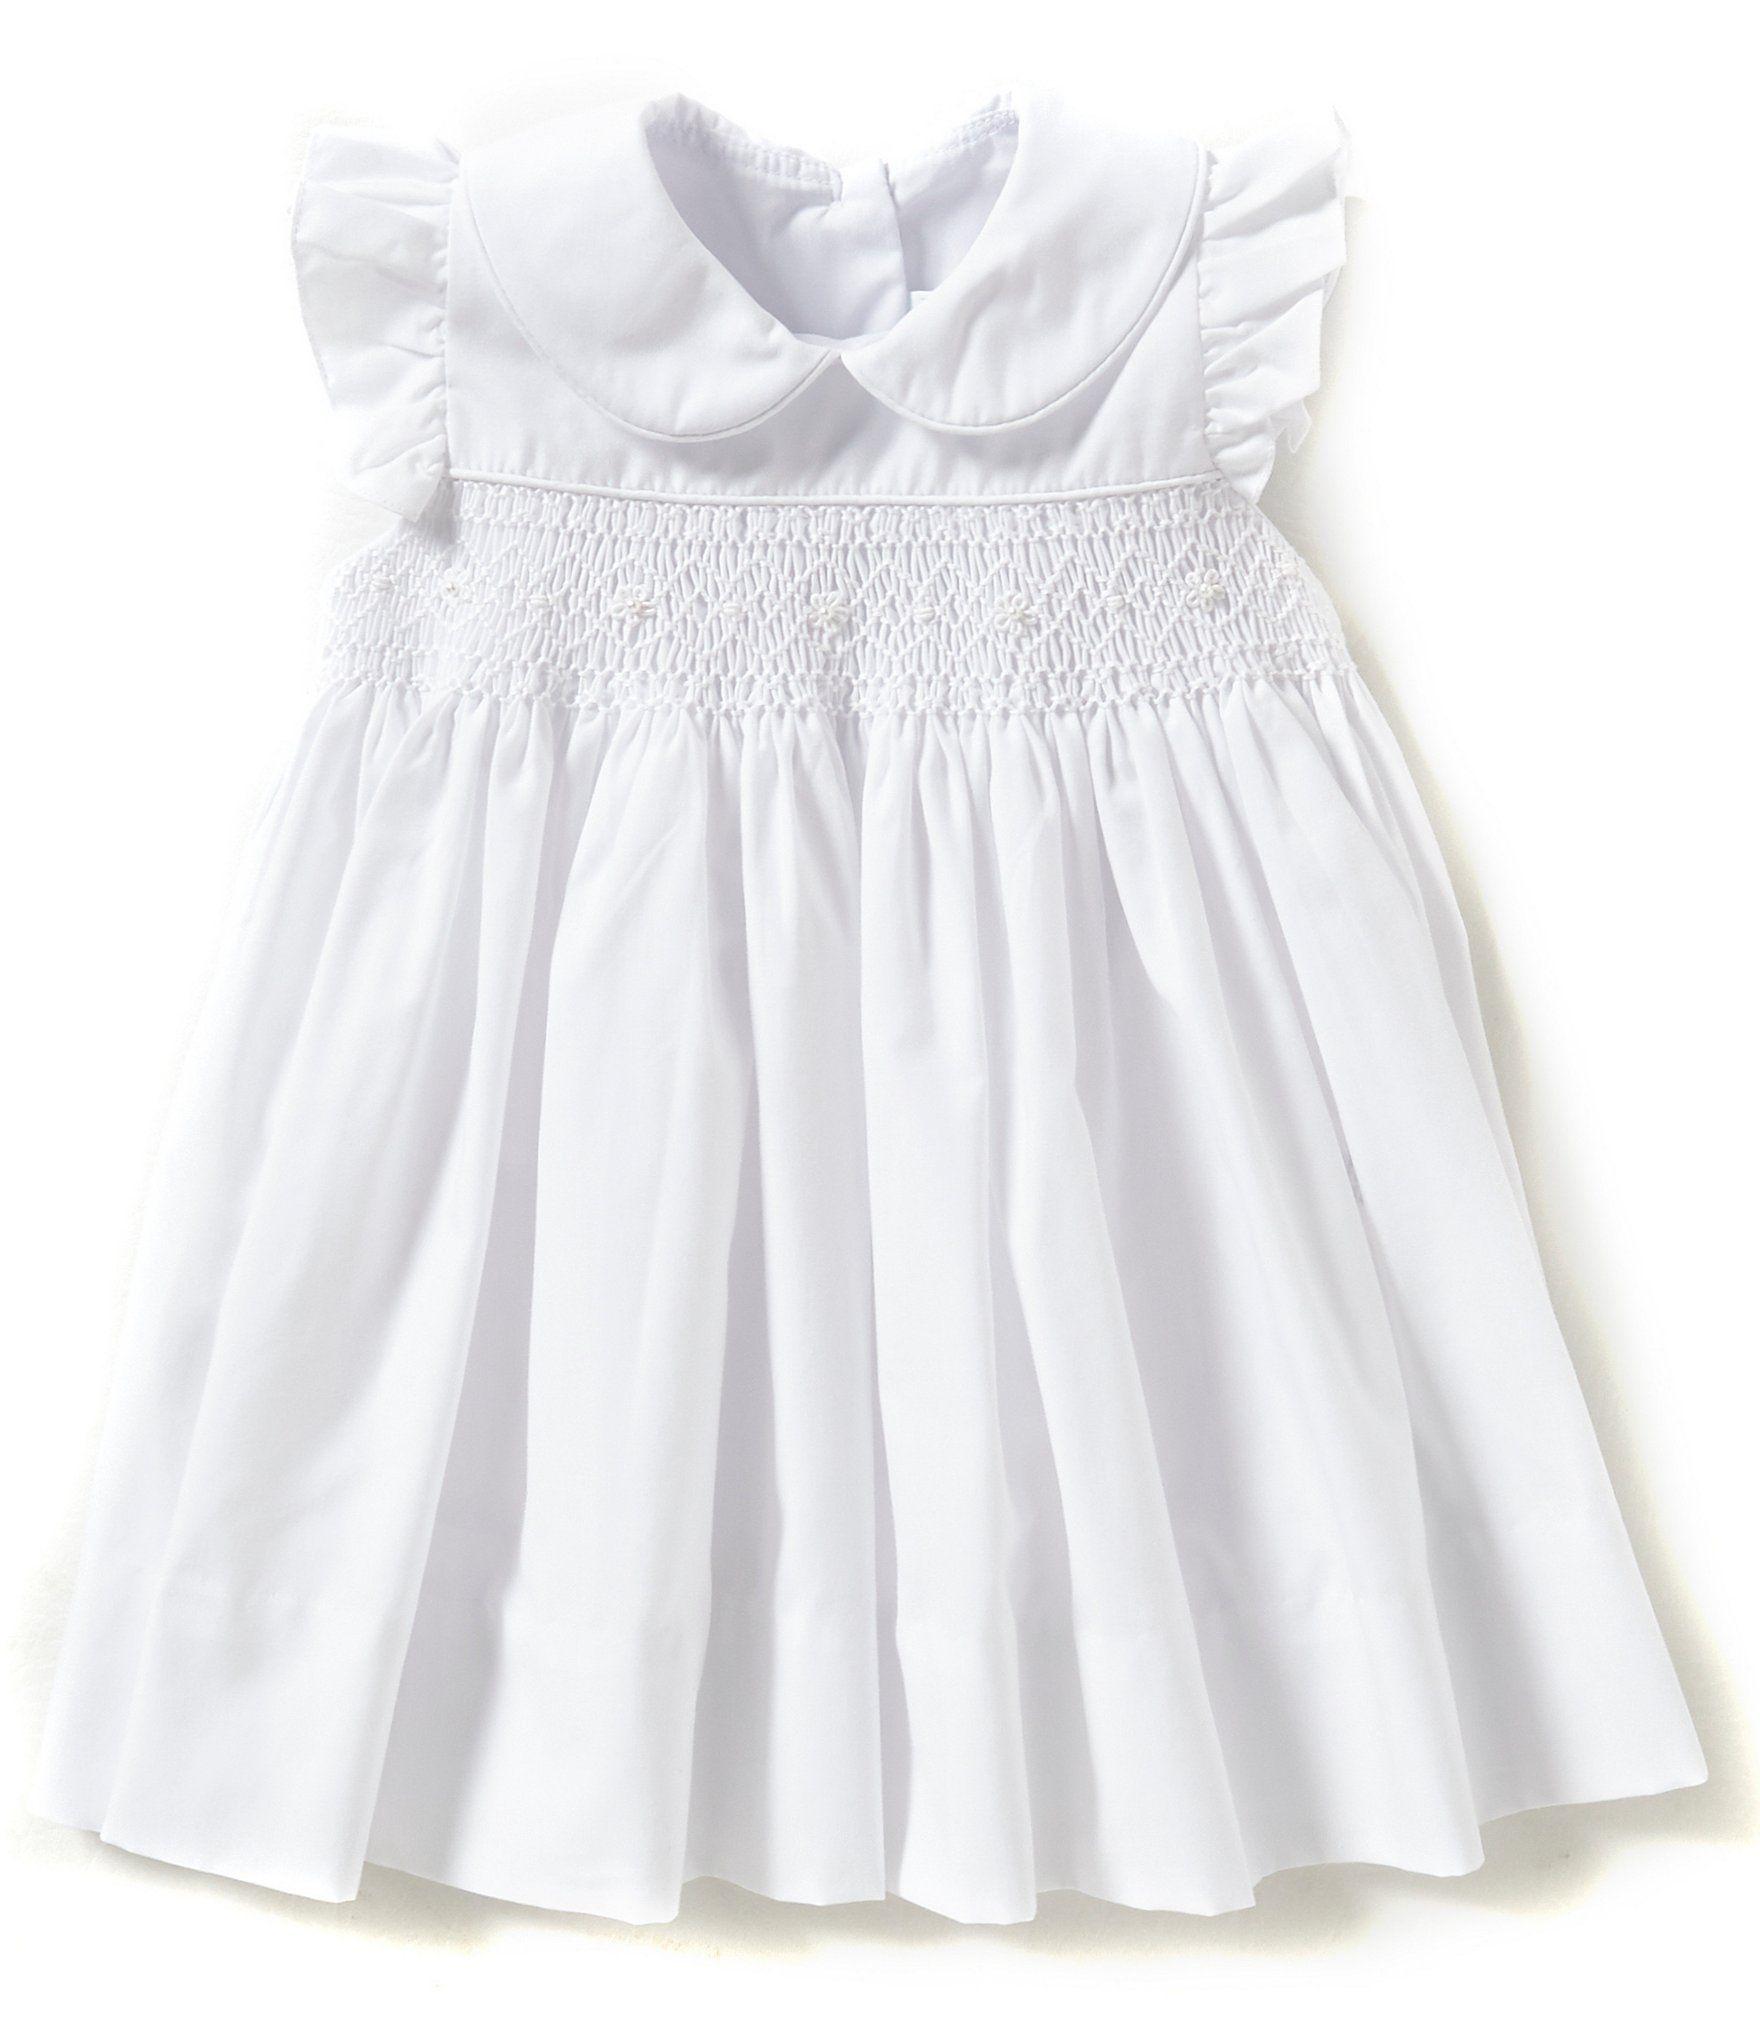 53e314b434 Shop for Edgehill Collection Baby Girls 3-9 Months Smocked Bishop Dress at  Dillards.com. Visit Dillards.com to find clothing